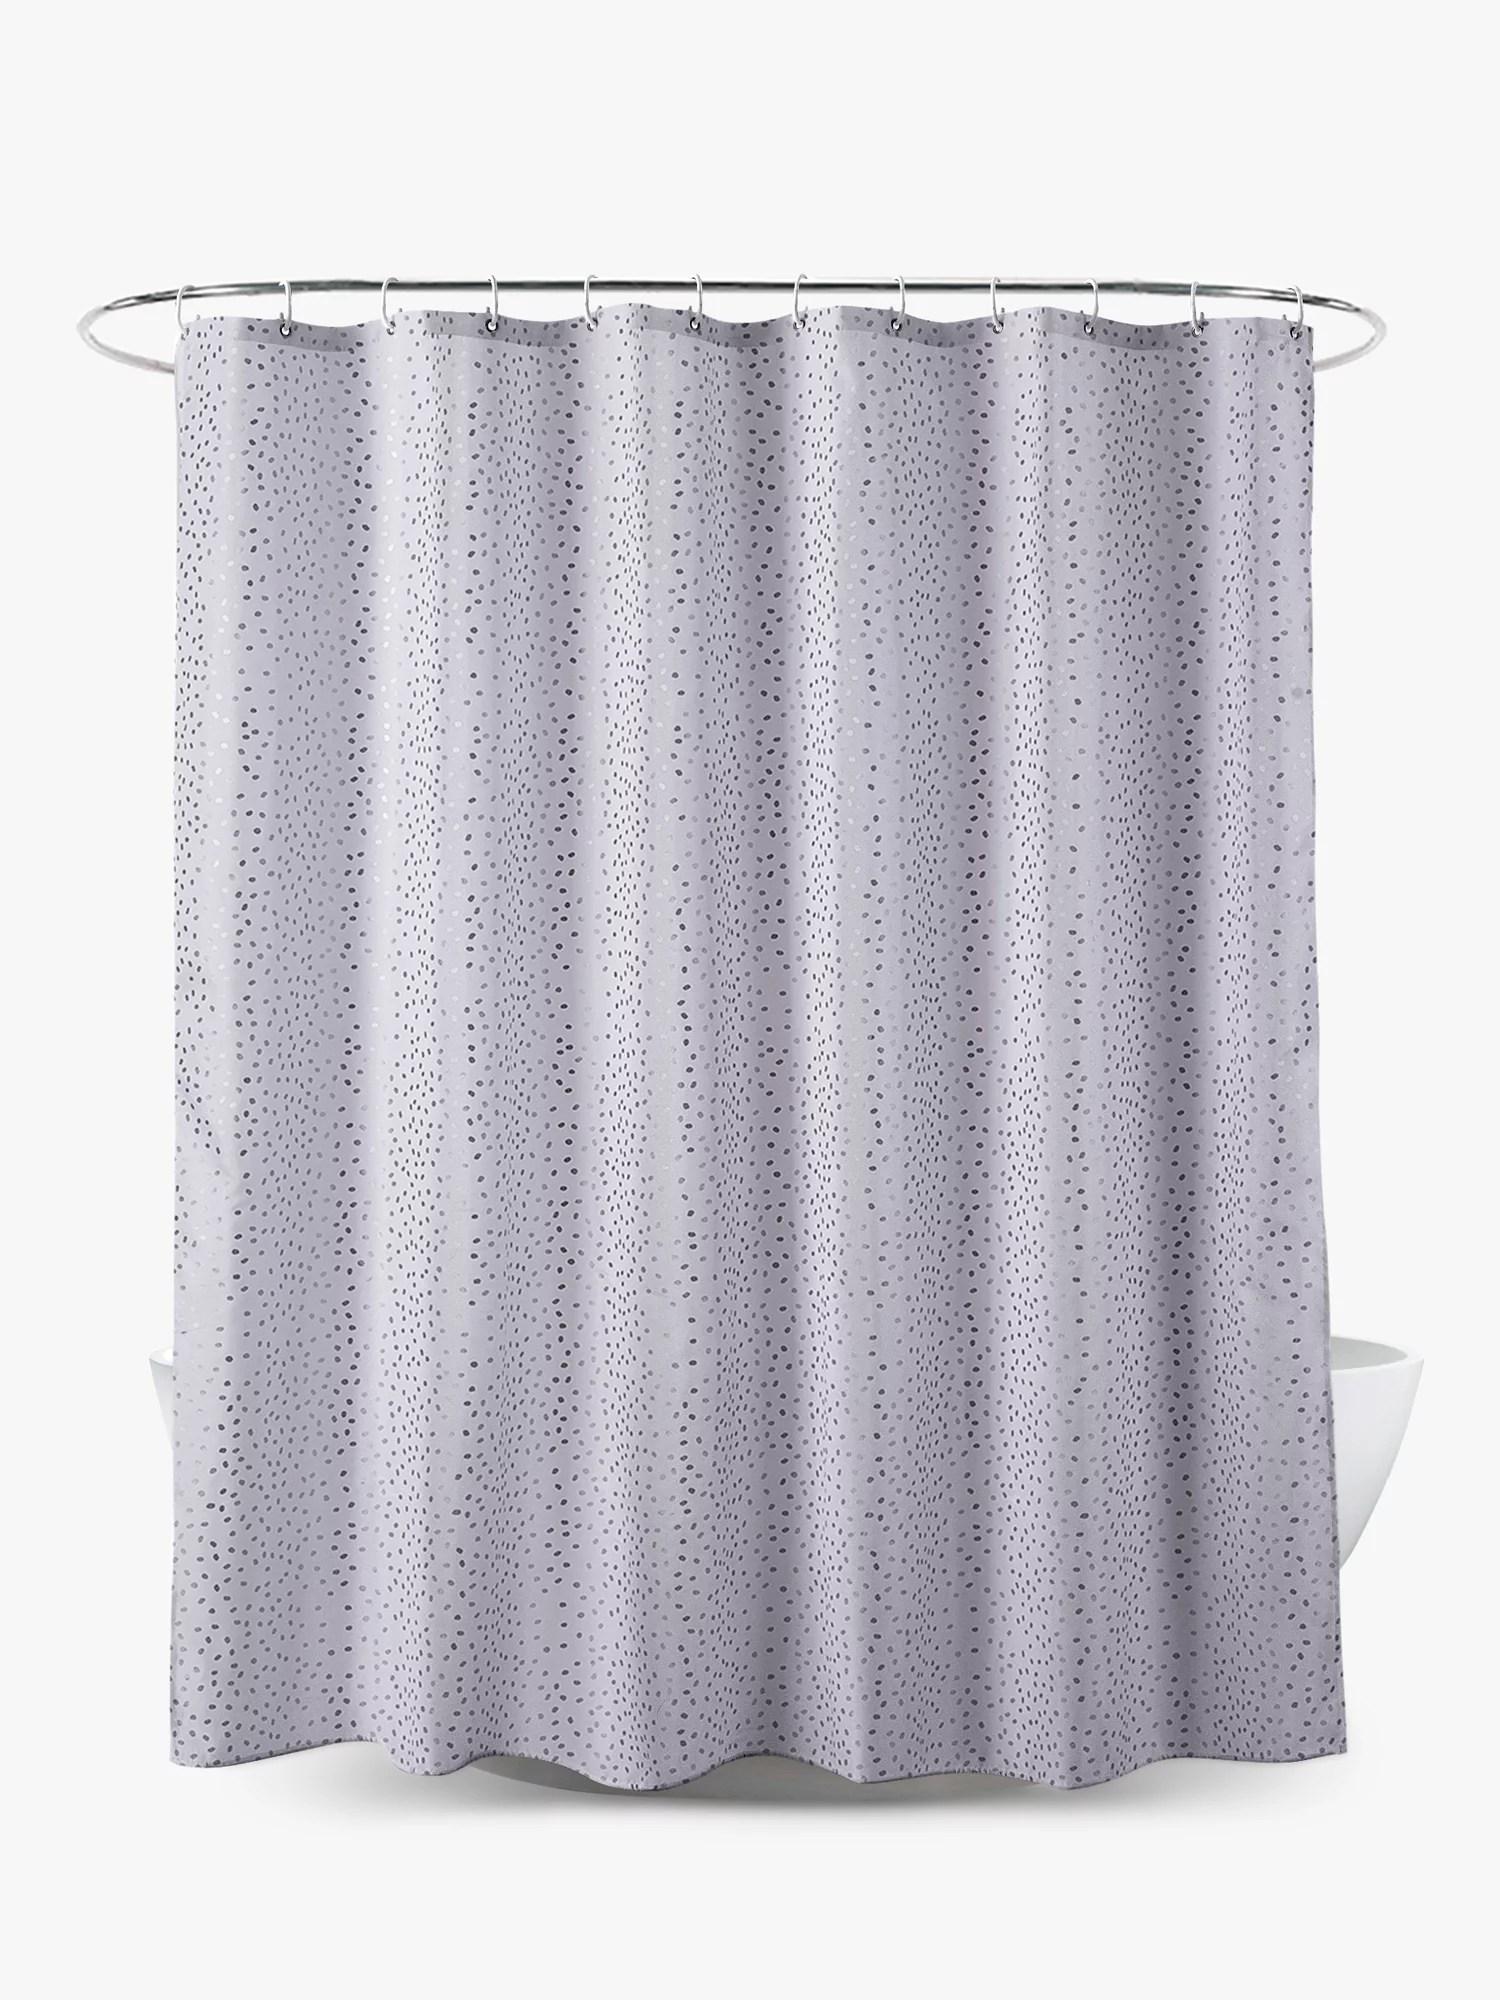 john lewis partners shimmering spots shower curtain